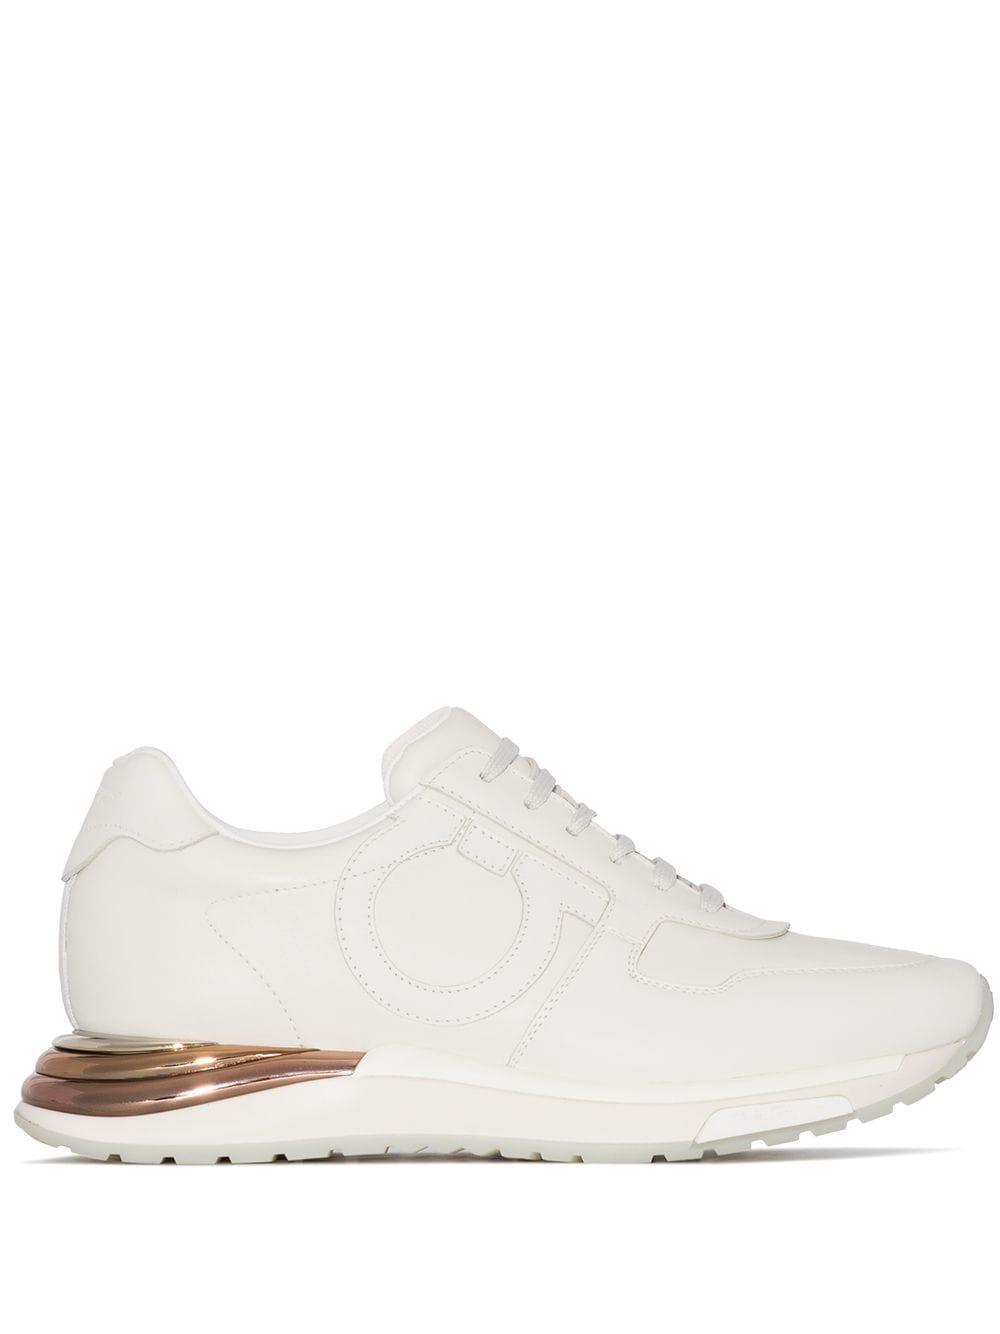 Brooklyn Leather Sneakers